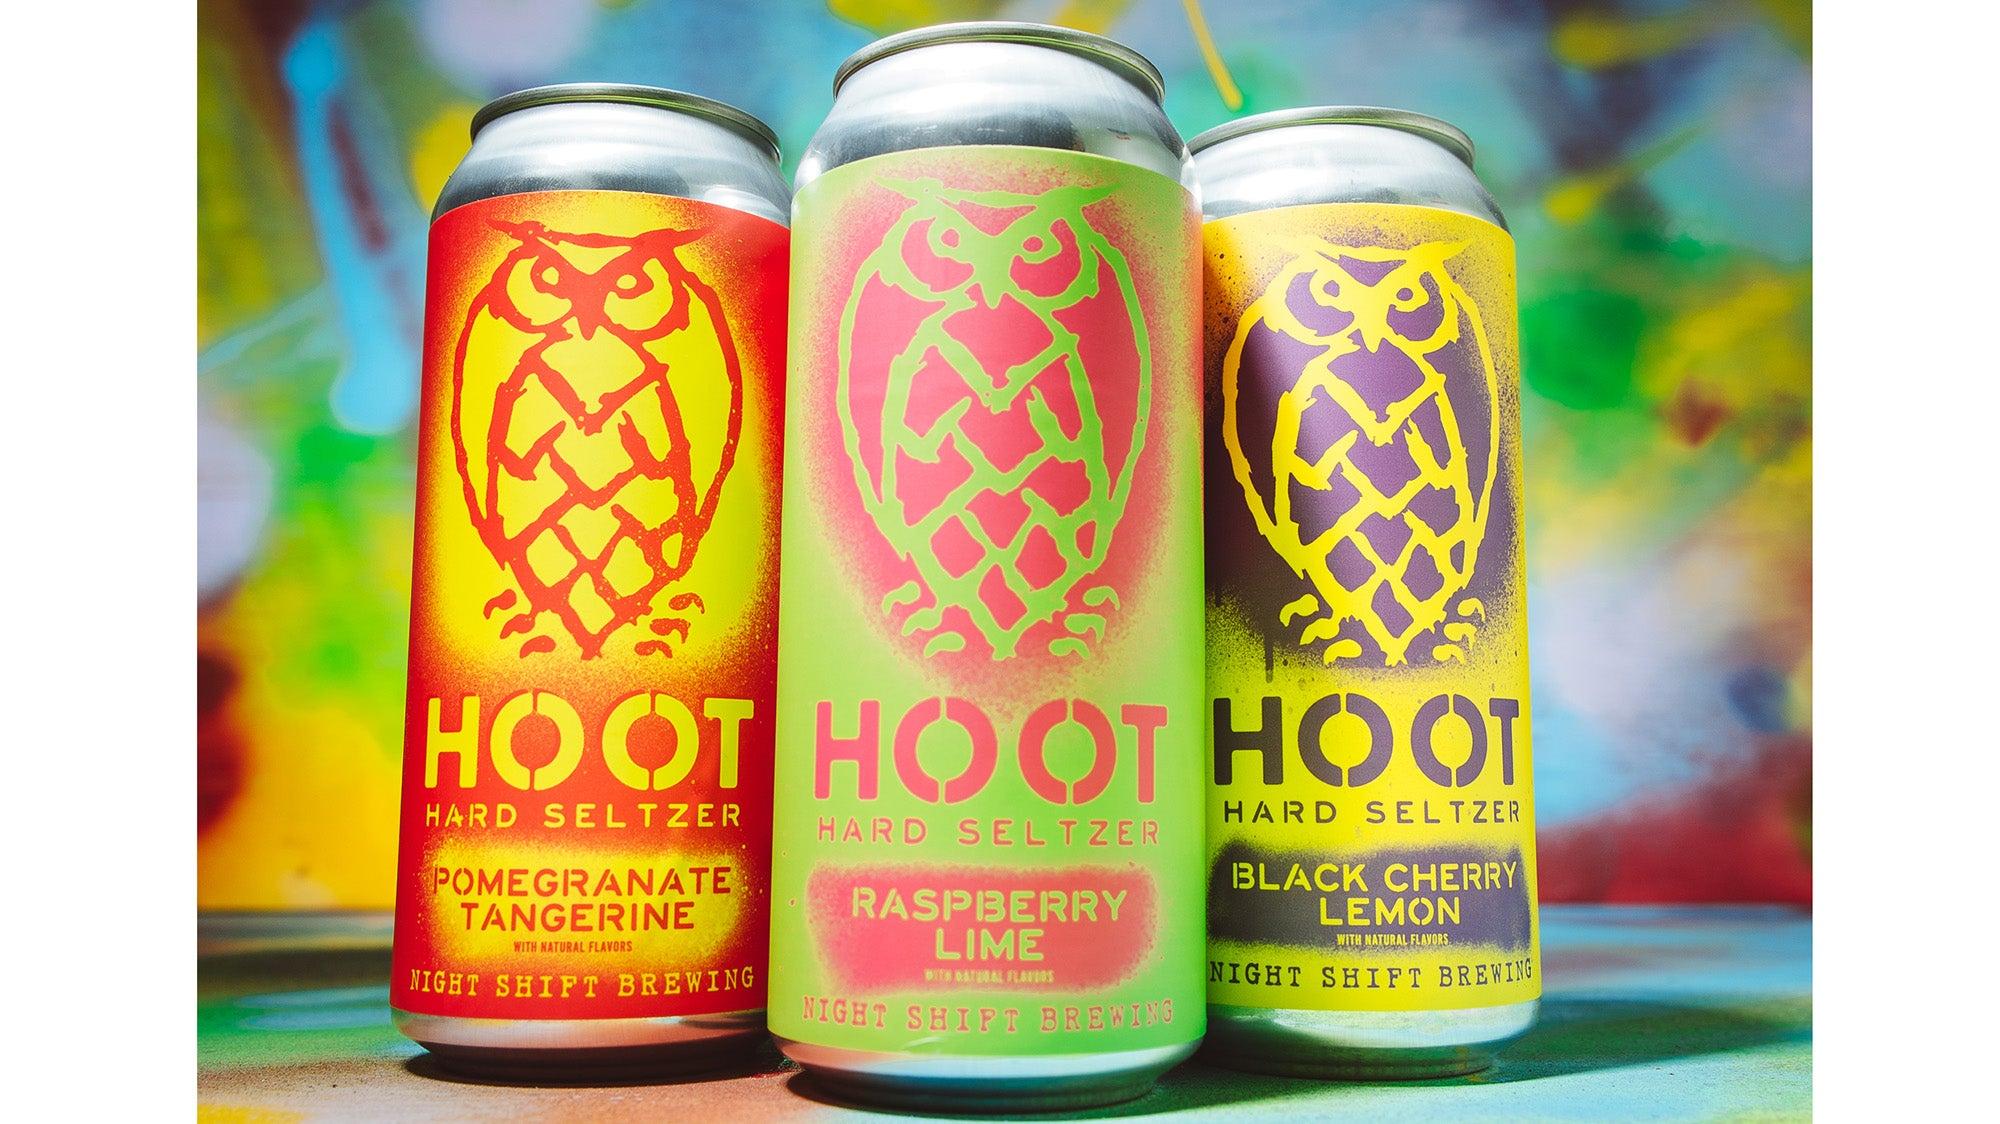 Hoot Hard Seltzer from Night Shift Brewing